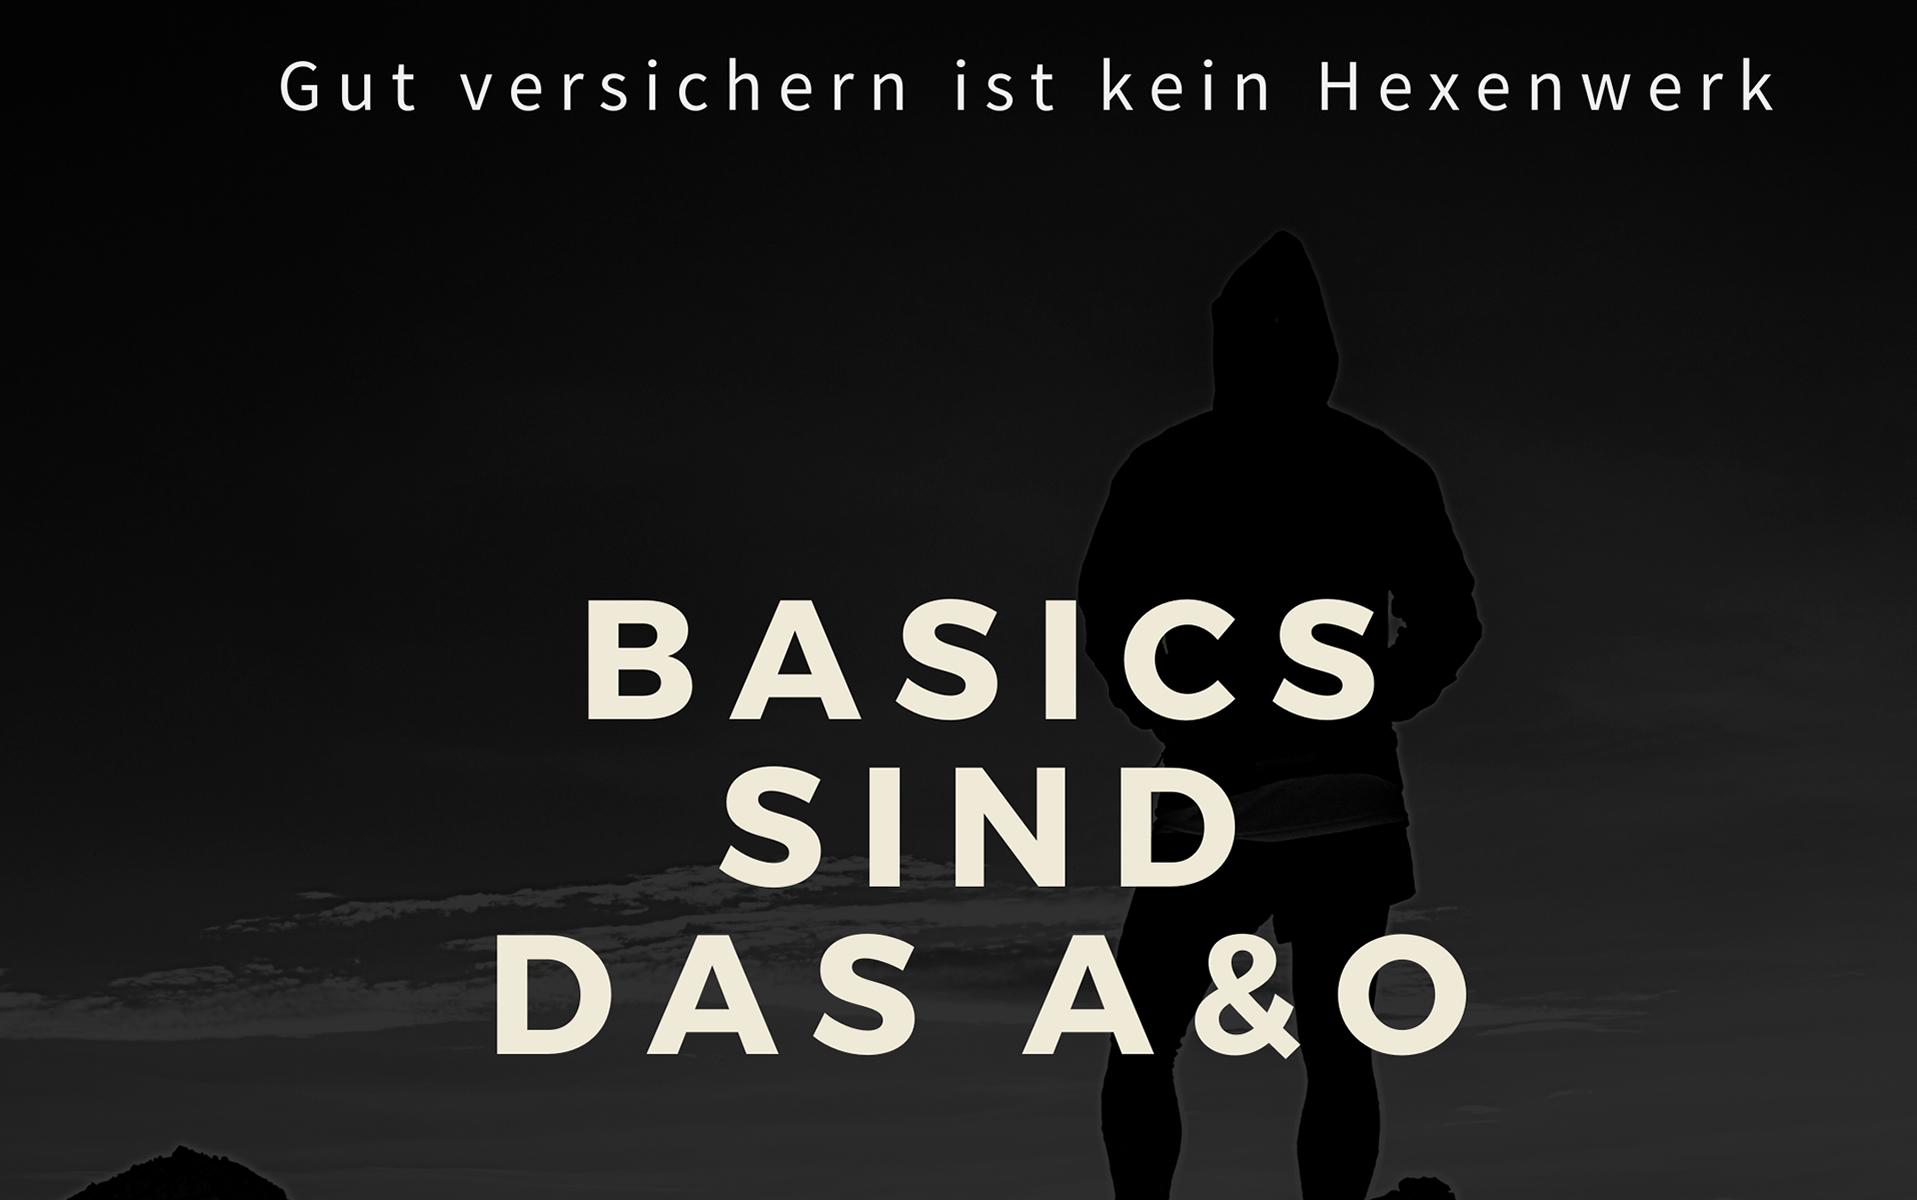 Versicherungs Basics sind das A &O